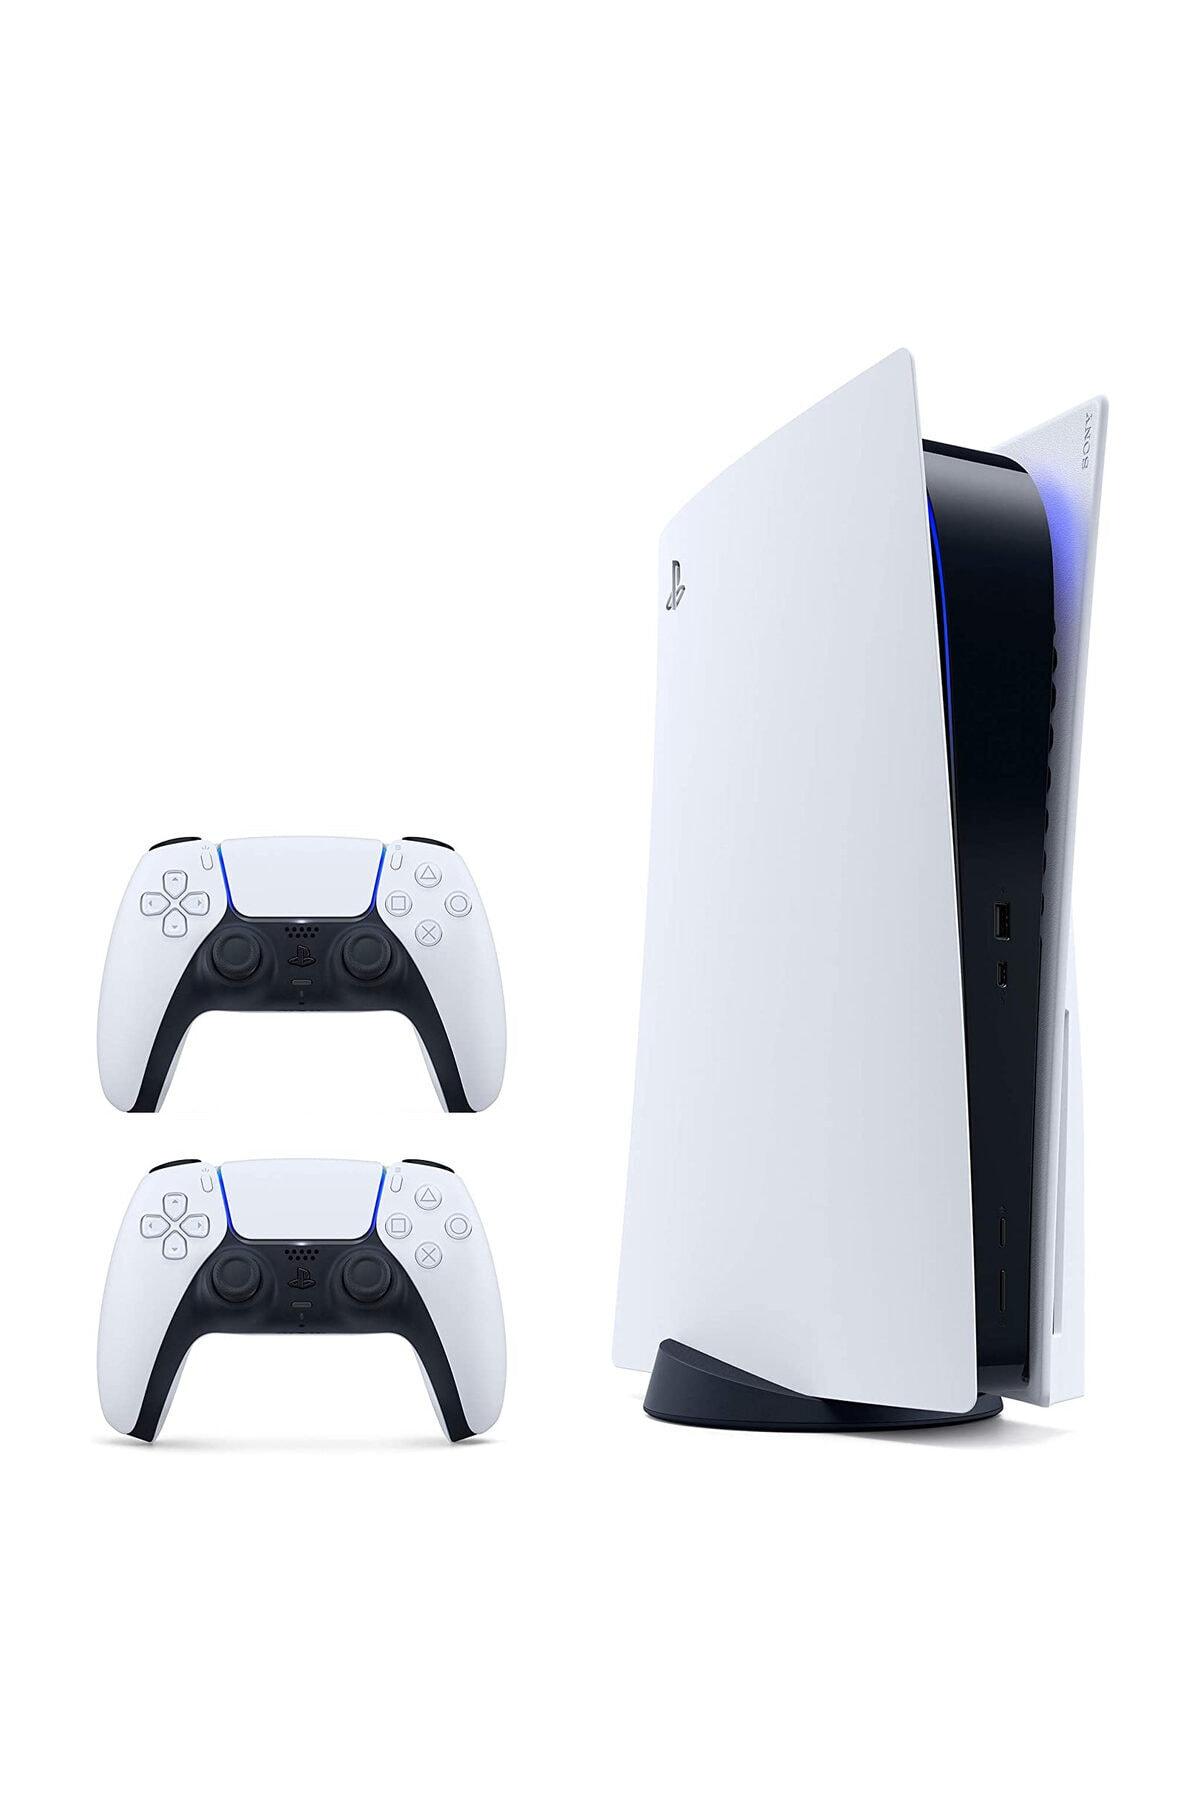 Sony Playstation 5 825 GB - Türkçe Menü + 2. PS5 DualSense (Eurasia Garantili) 2